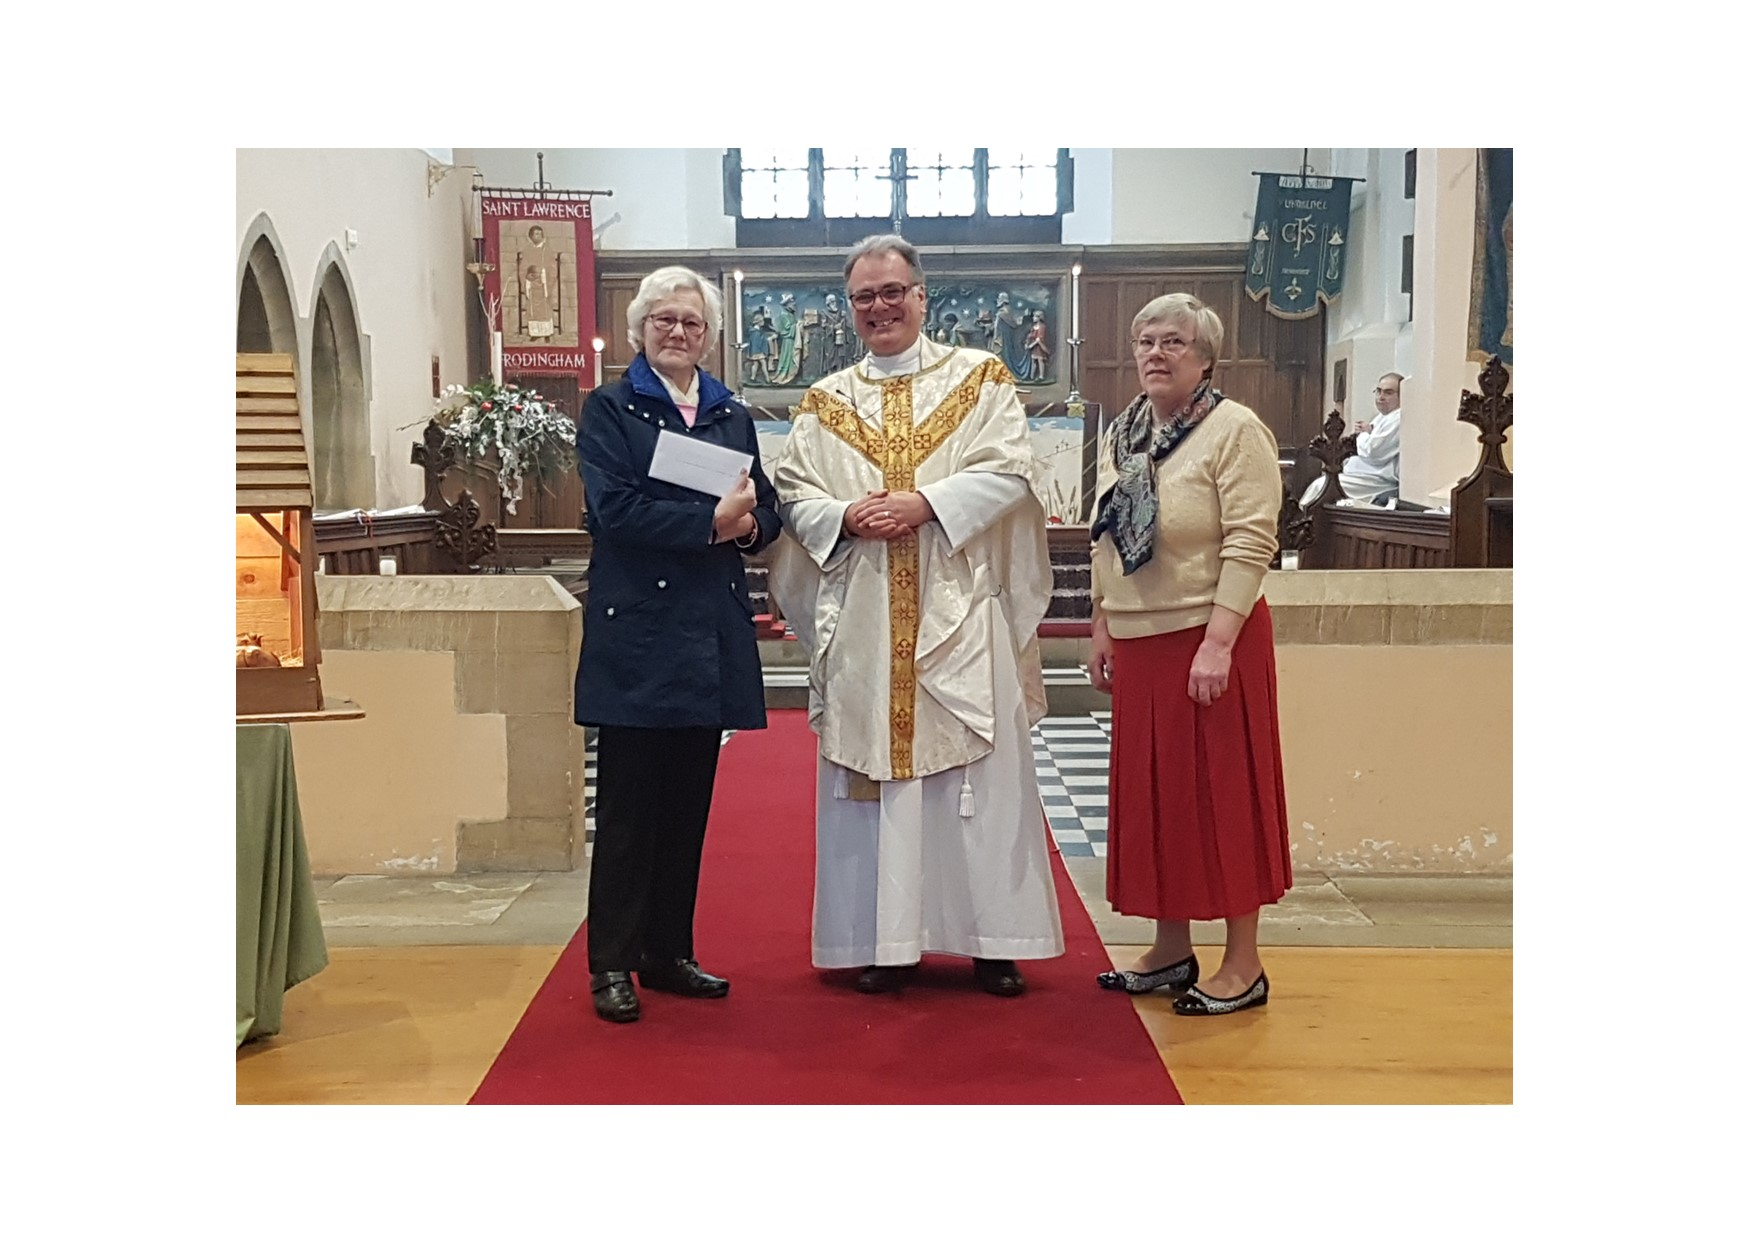 Rev. Philip and Jane